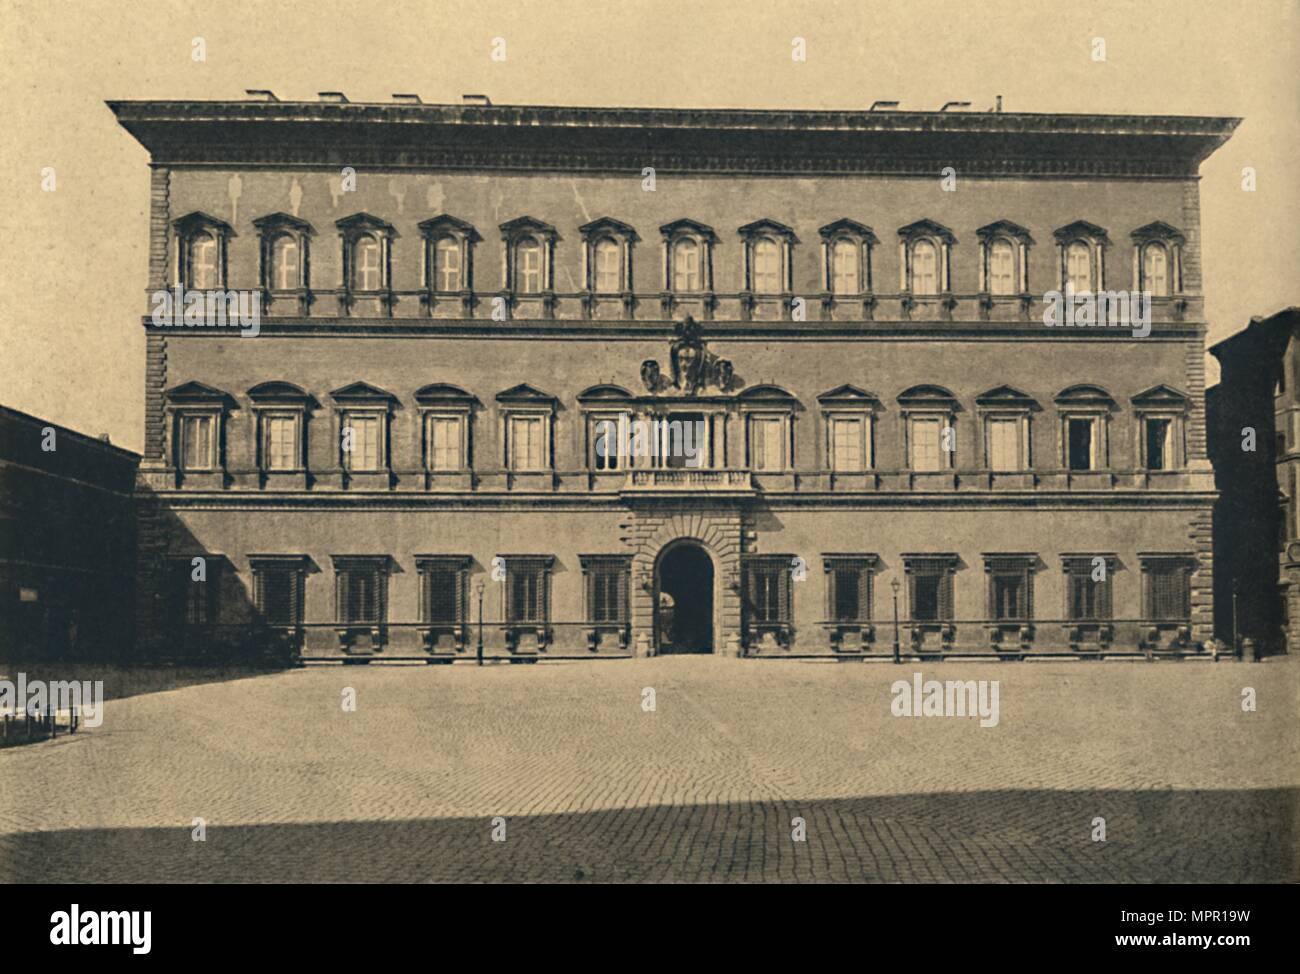 'Roma - Farnese Palace', 1910. Artist: Unknown. - Stock Image